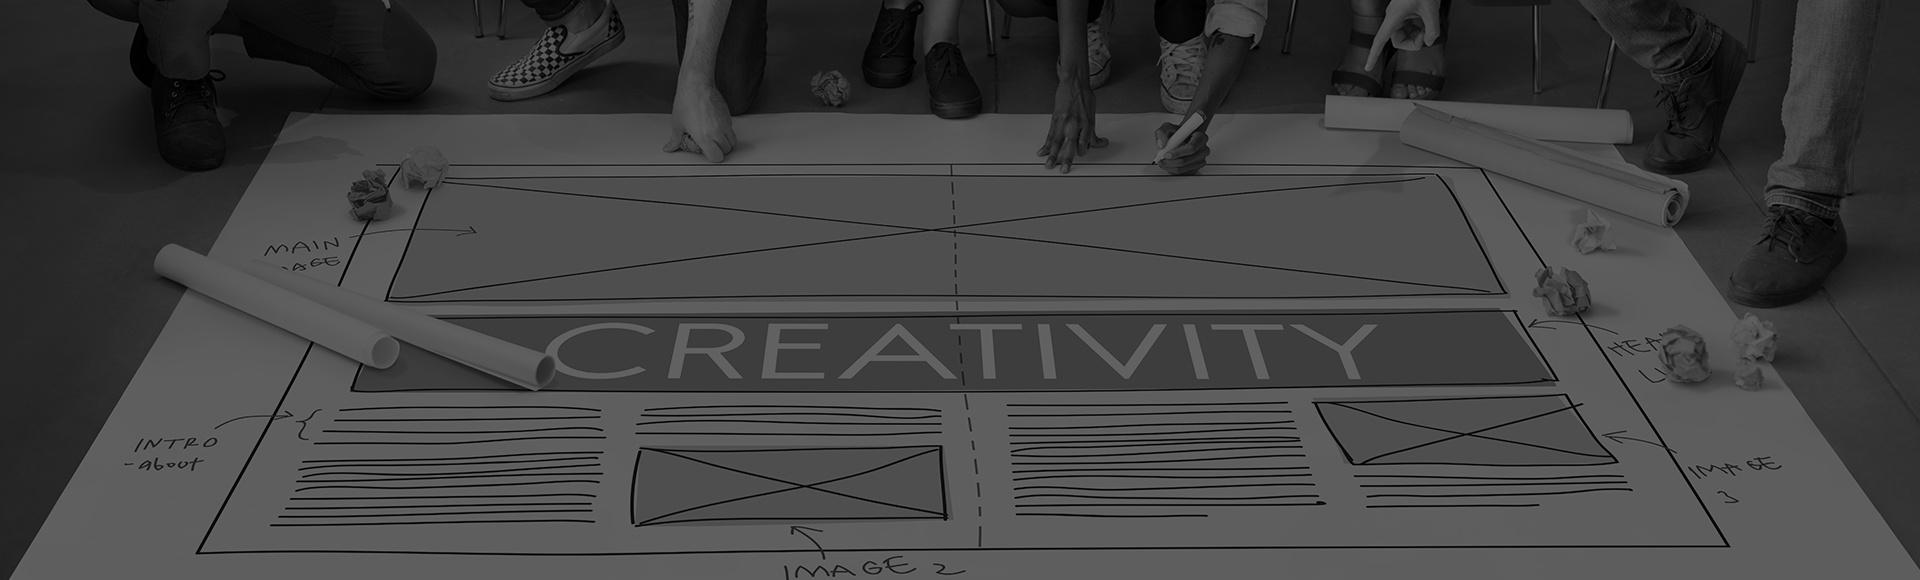 custom-website-design-and-development-banner